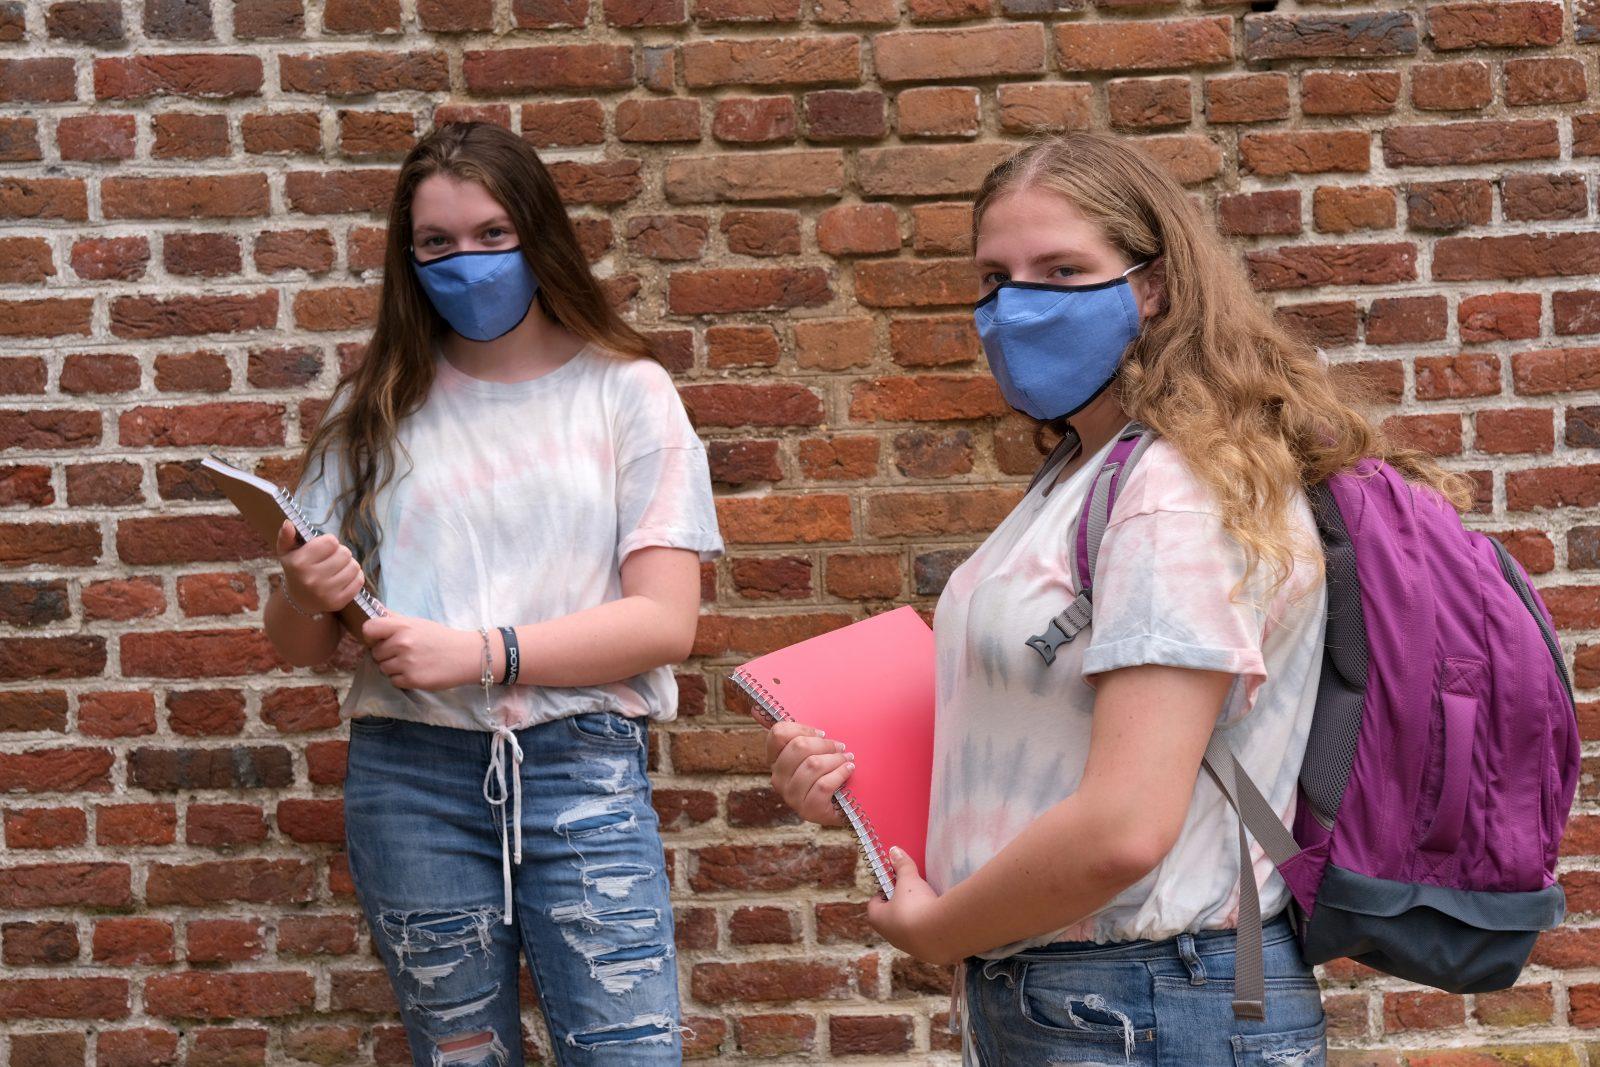 COVID-19 : la police lance un appel de prudence aux jeunes